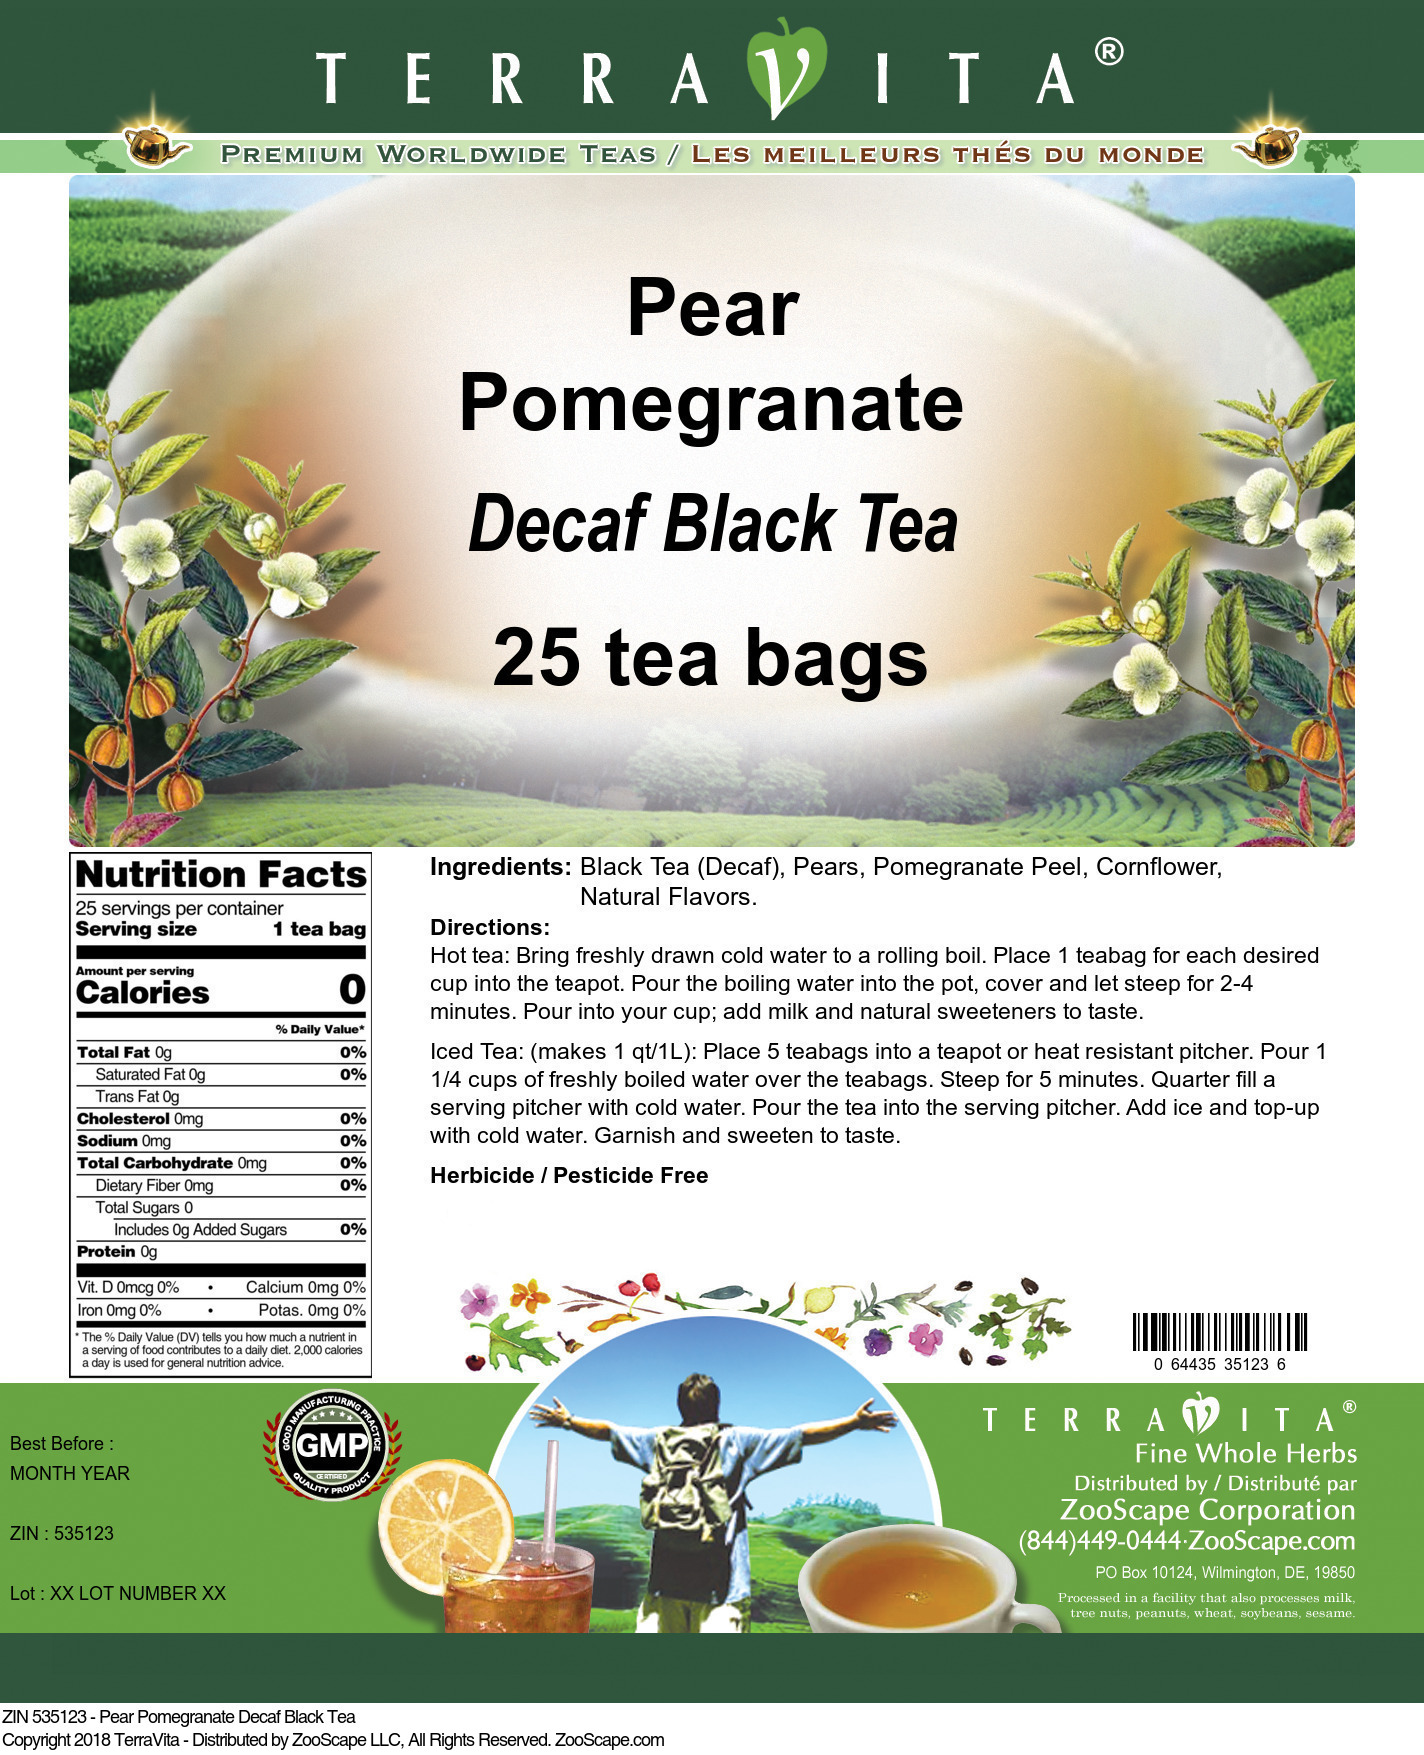 Pear Pomegranate Decaf Black Tea